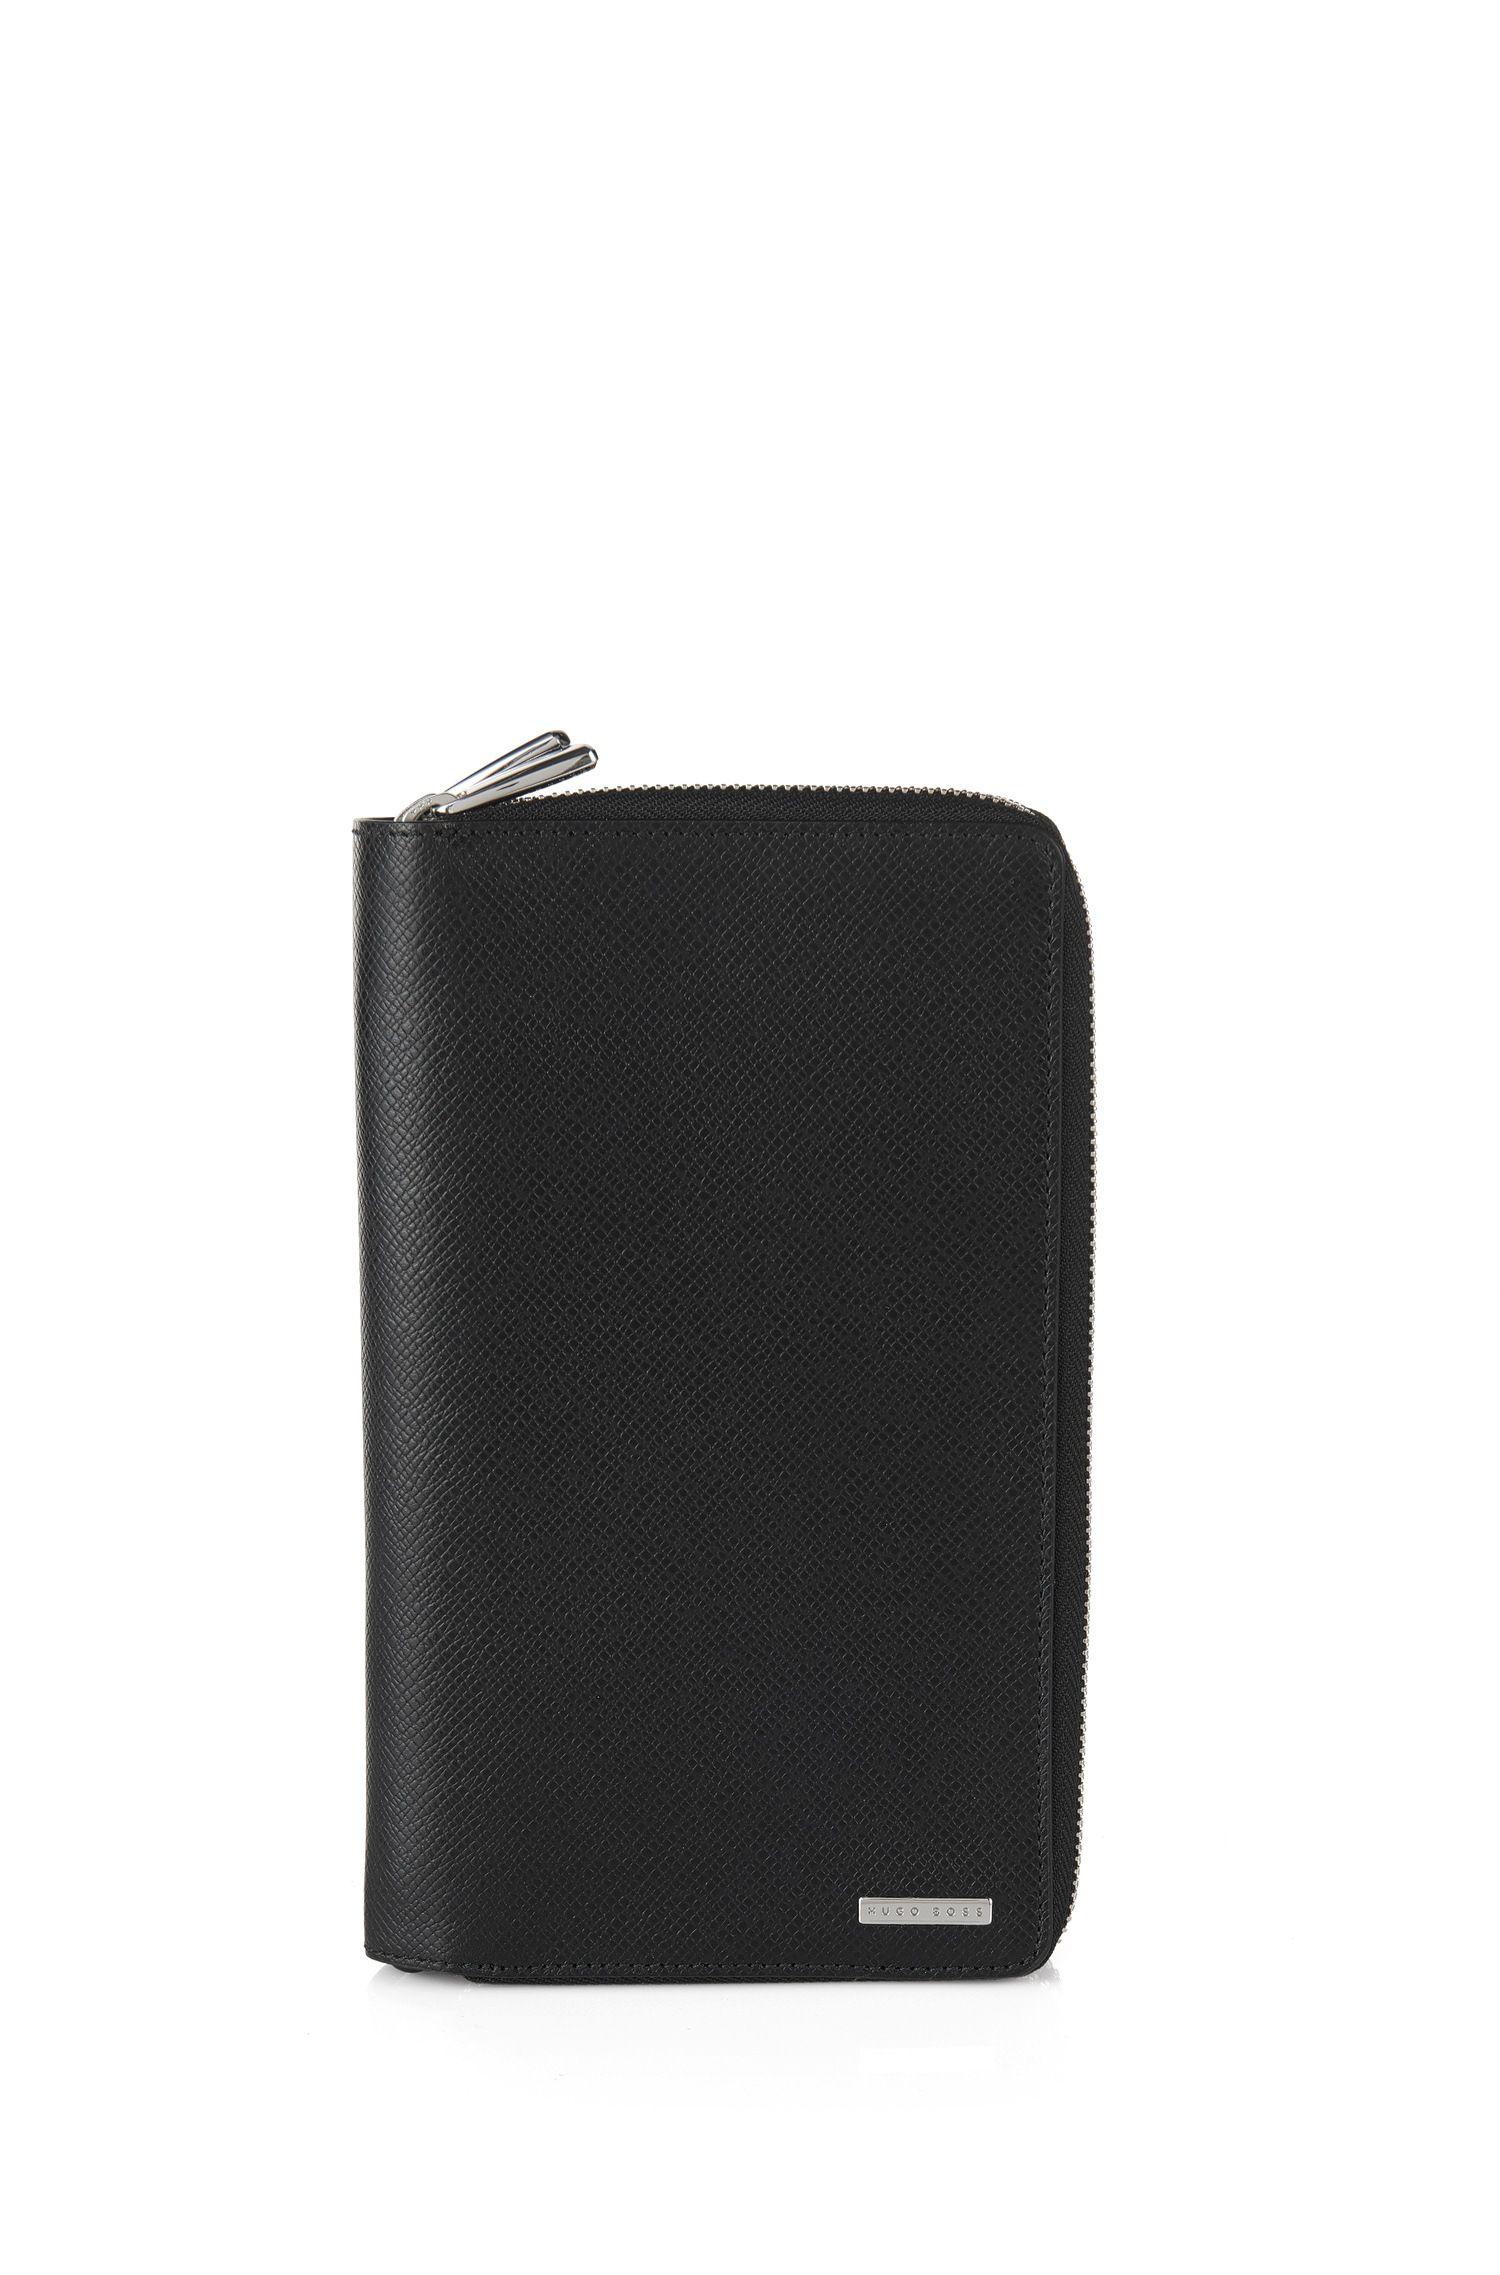 'Signature_D Zip Trav'   Leather Travel Organizer, Black